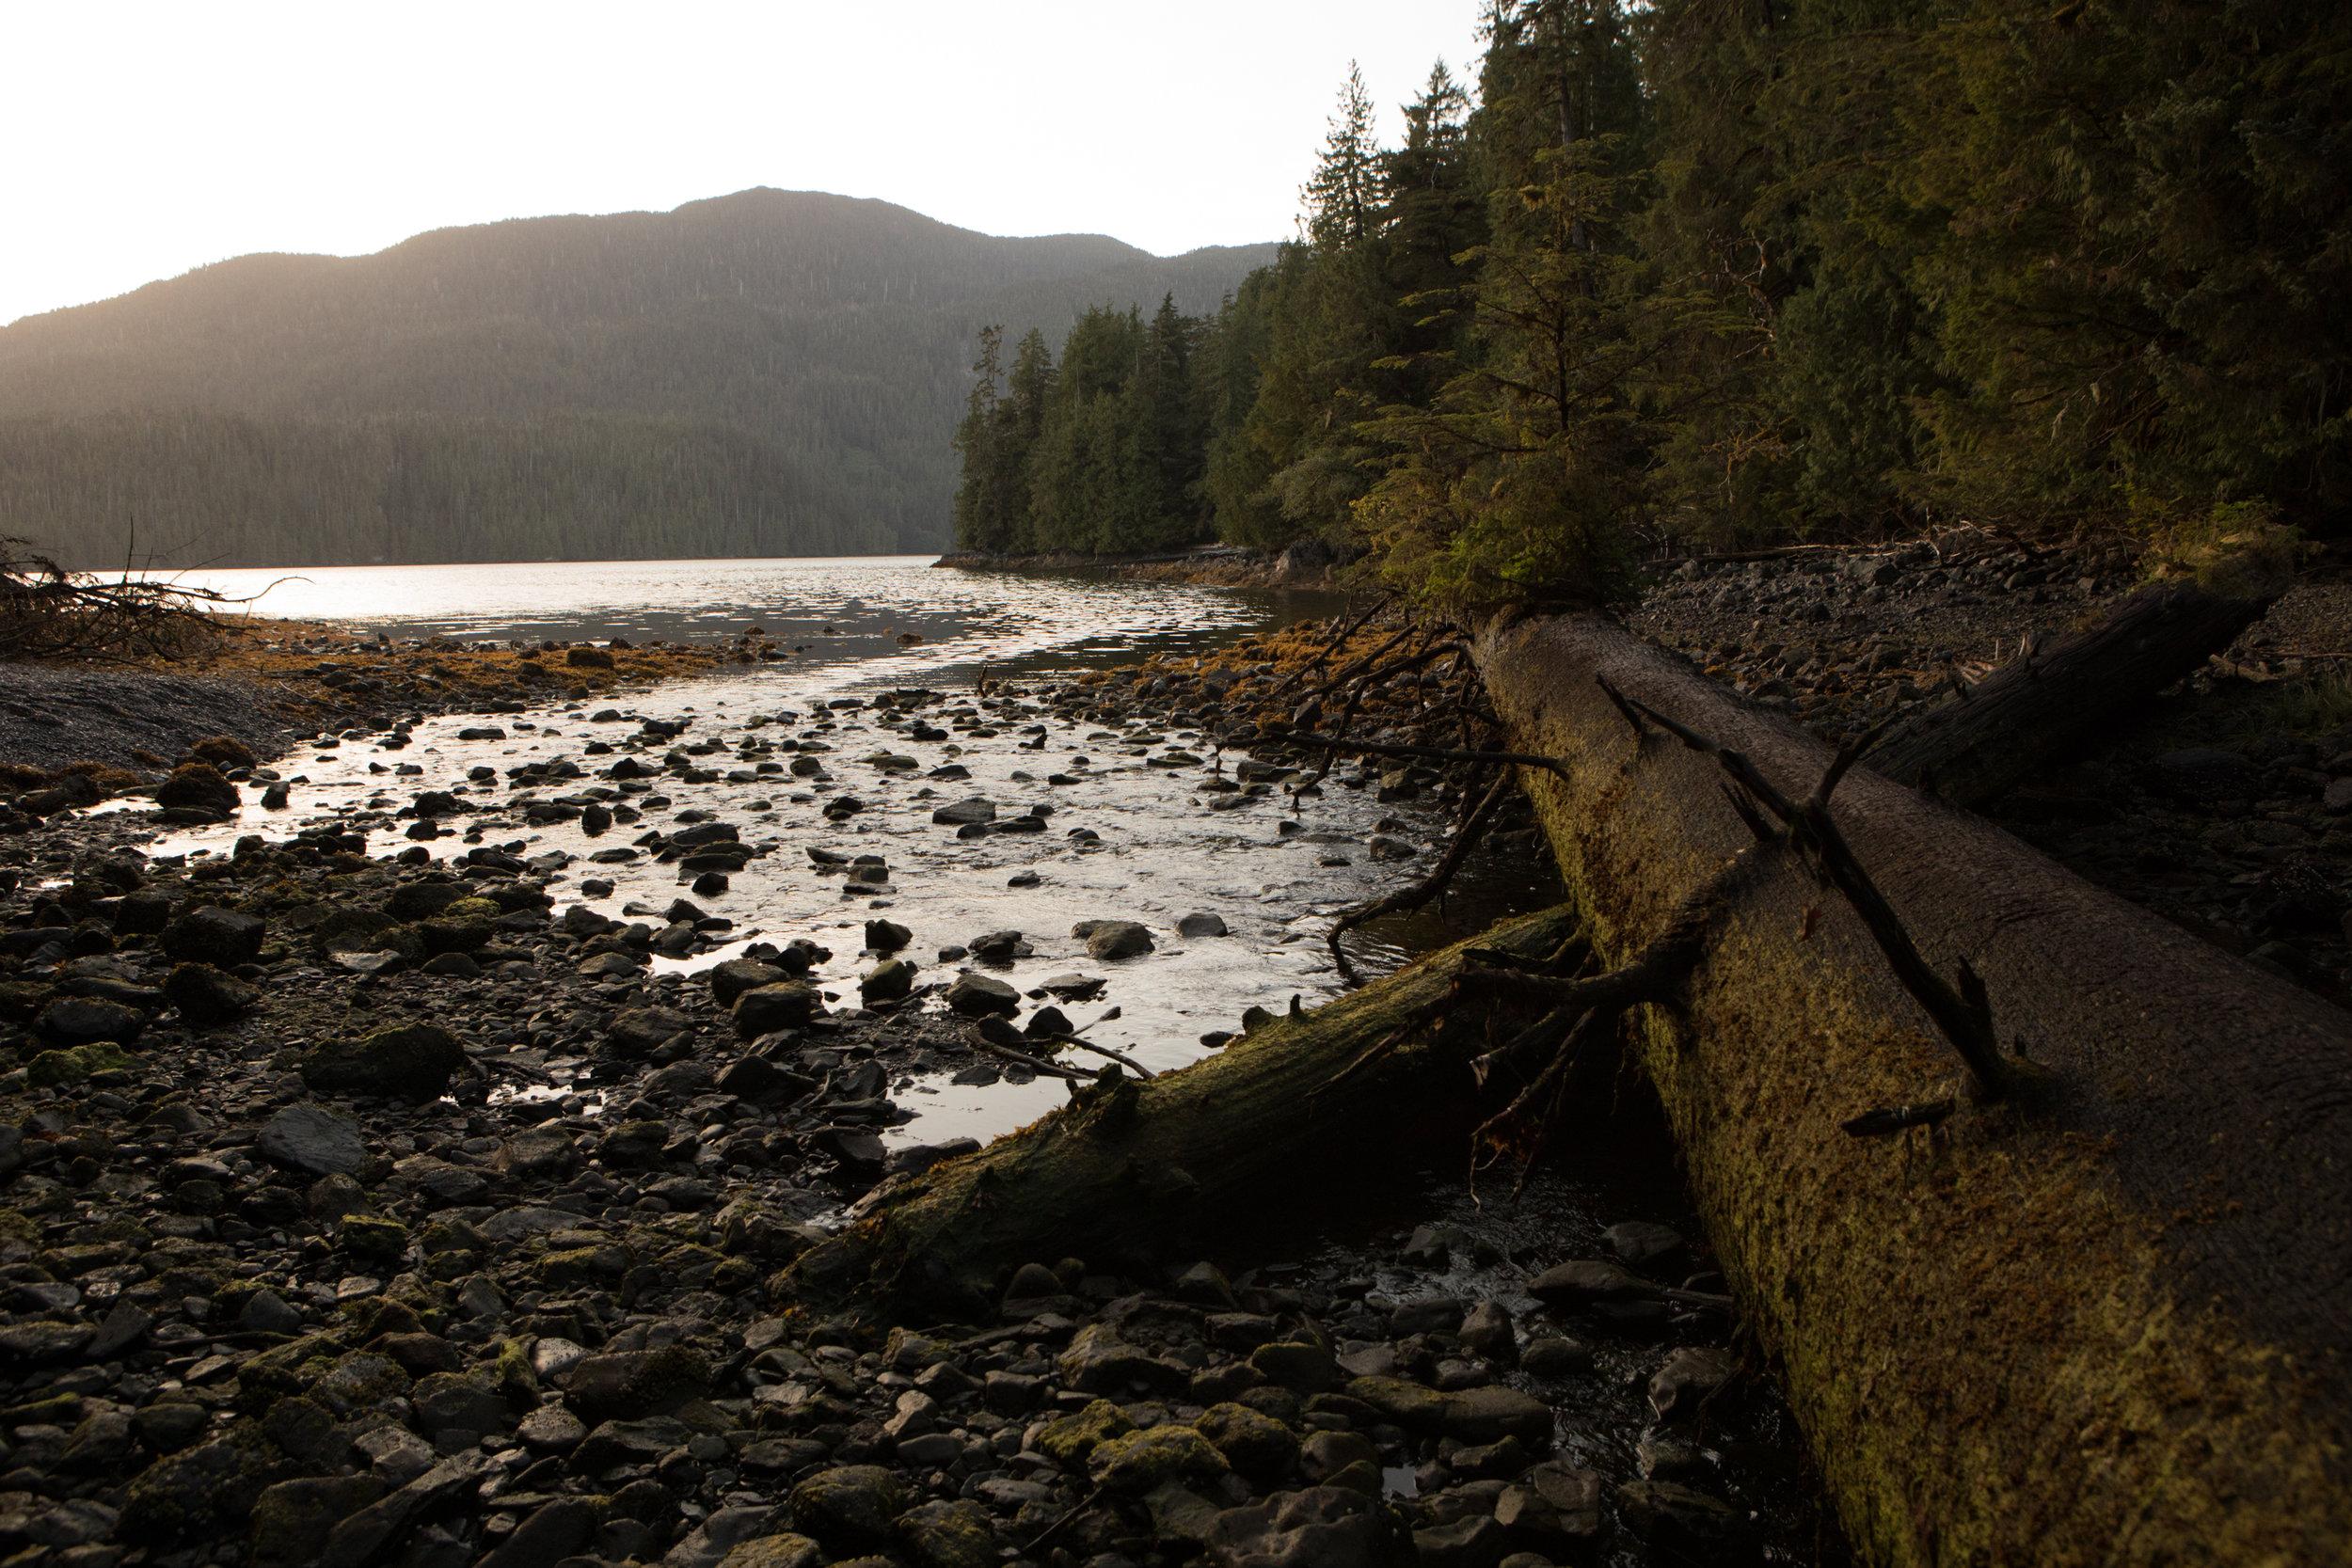 River mouth at low tide, Klakas Inlet